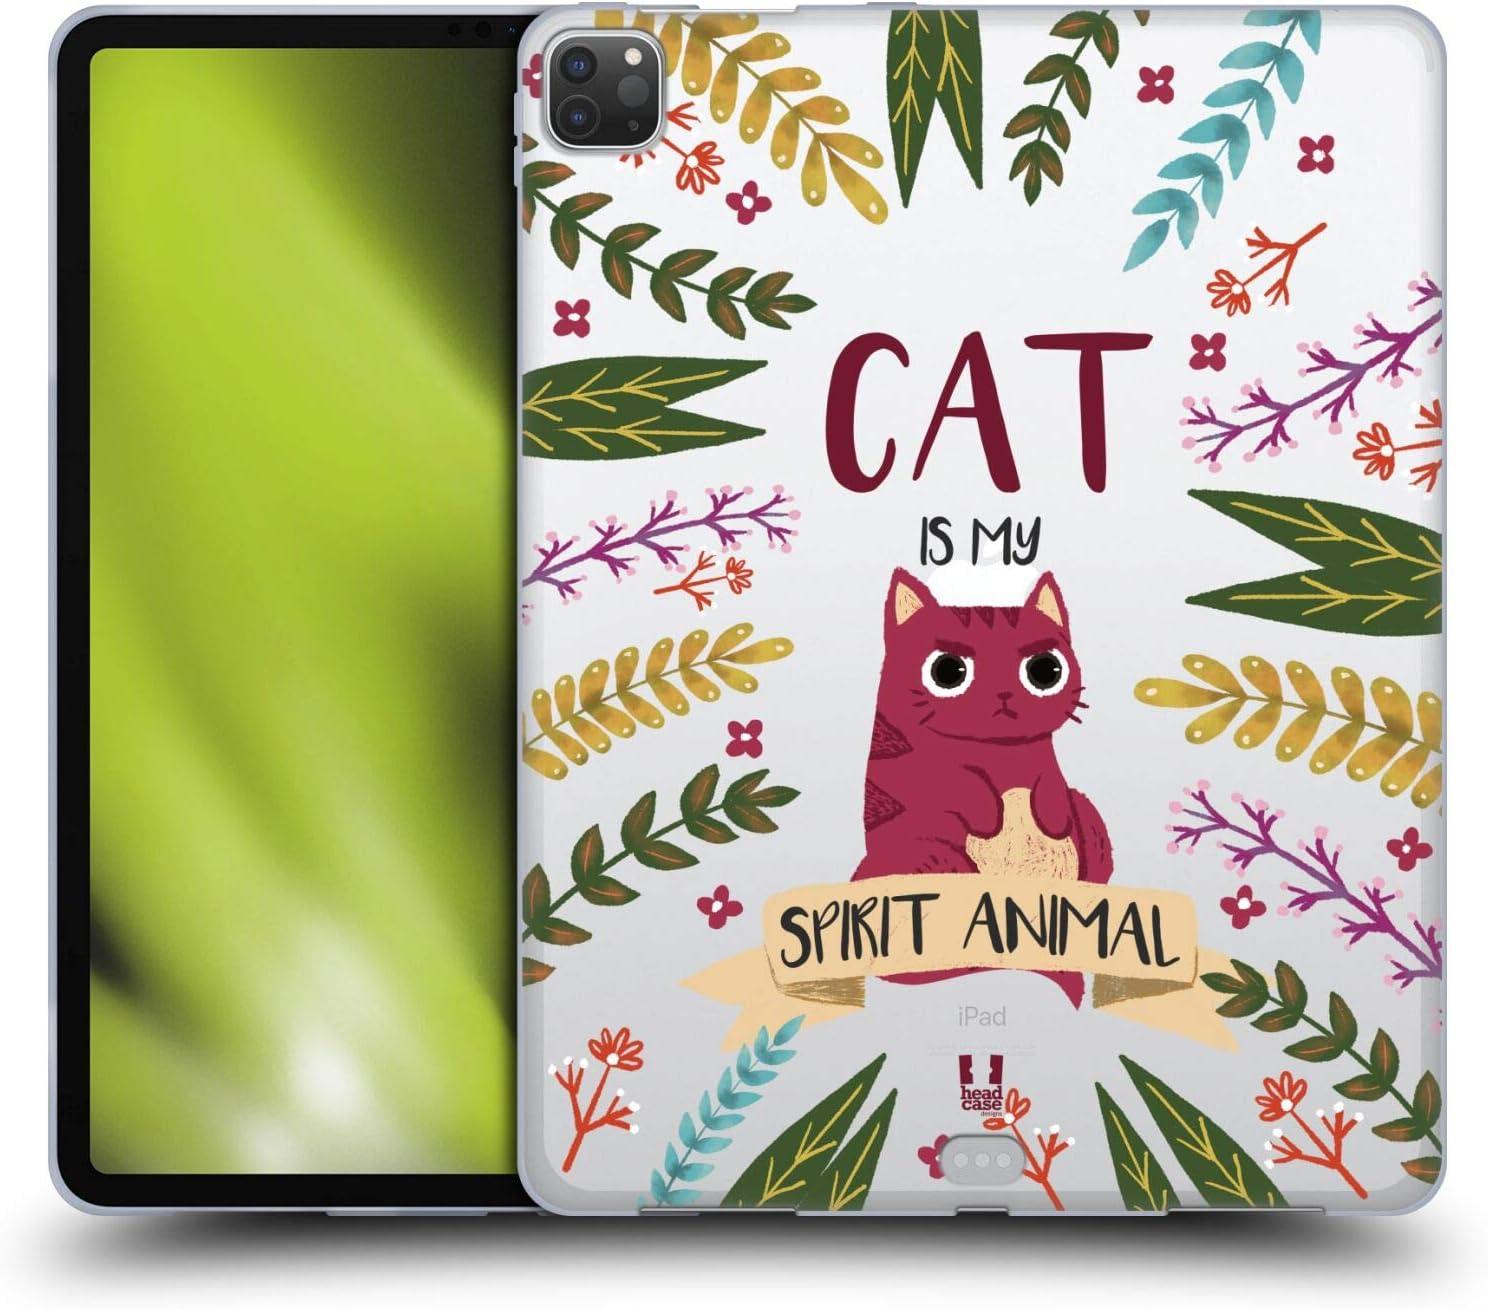 Head Case Designs Cat Spirit Animal Illustrations Soft Gel Case Compatible with Apple iPad Pro 12.9 (2020 / 2021)